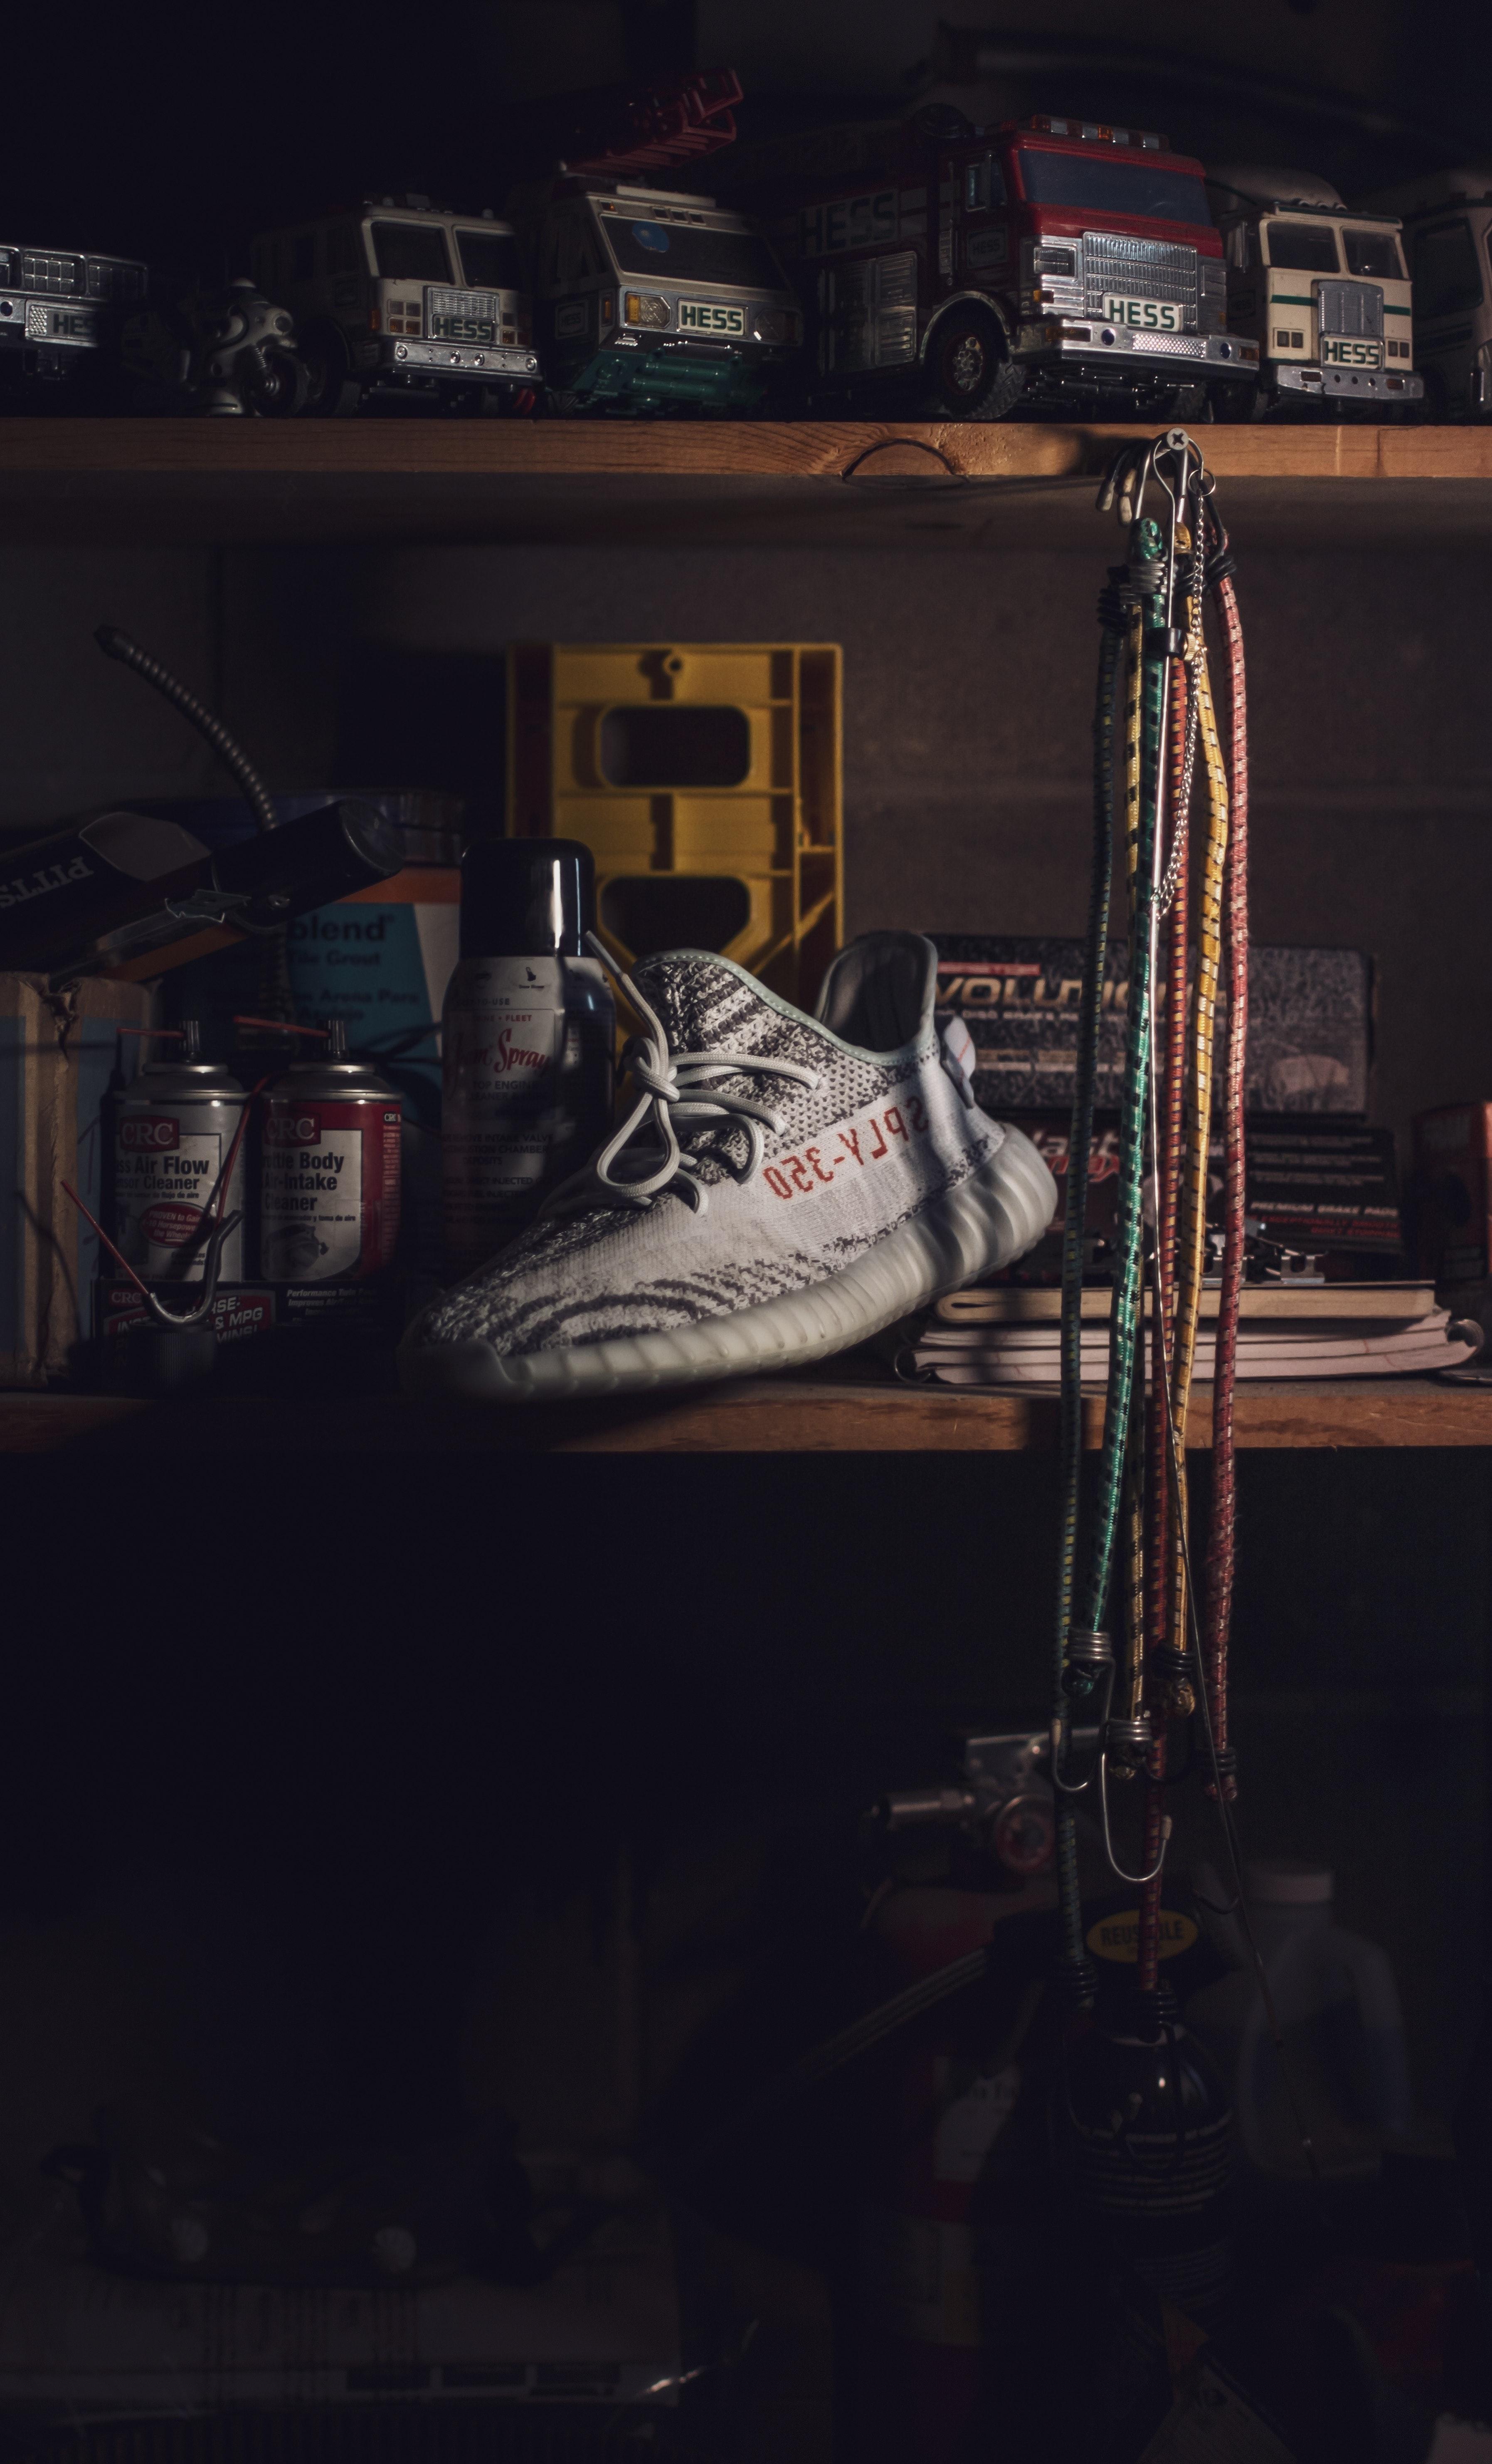 Unpaired Beluga Adidas Yeezy Boost 350 Shoe · Free Stock Photo